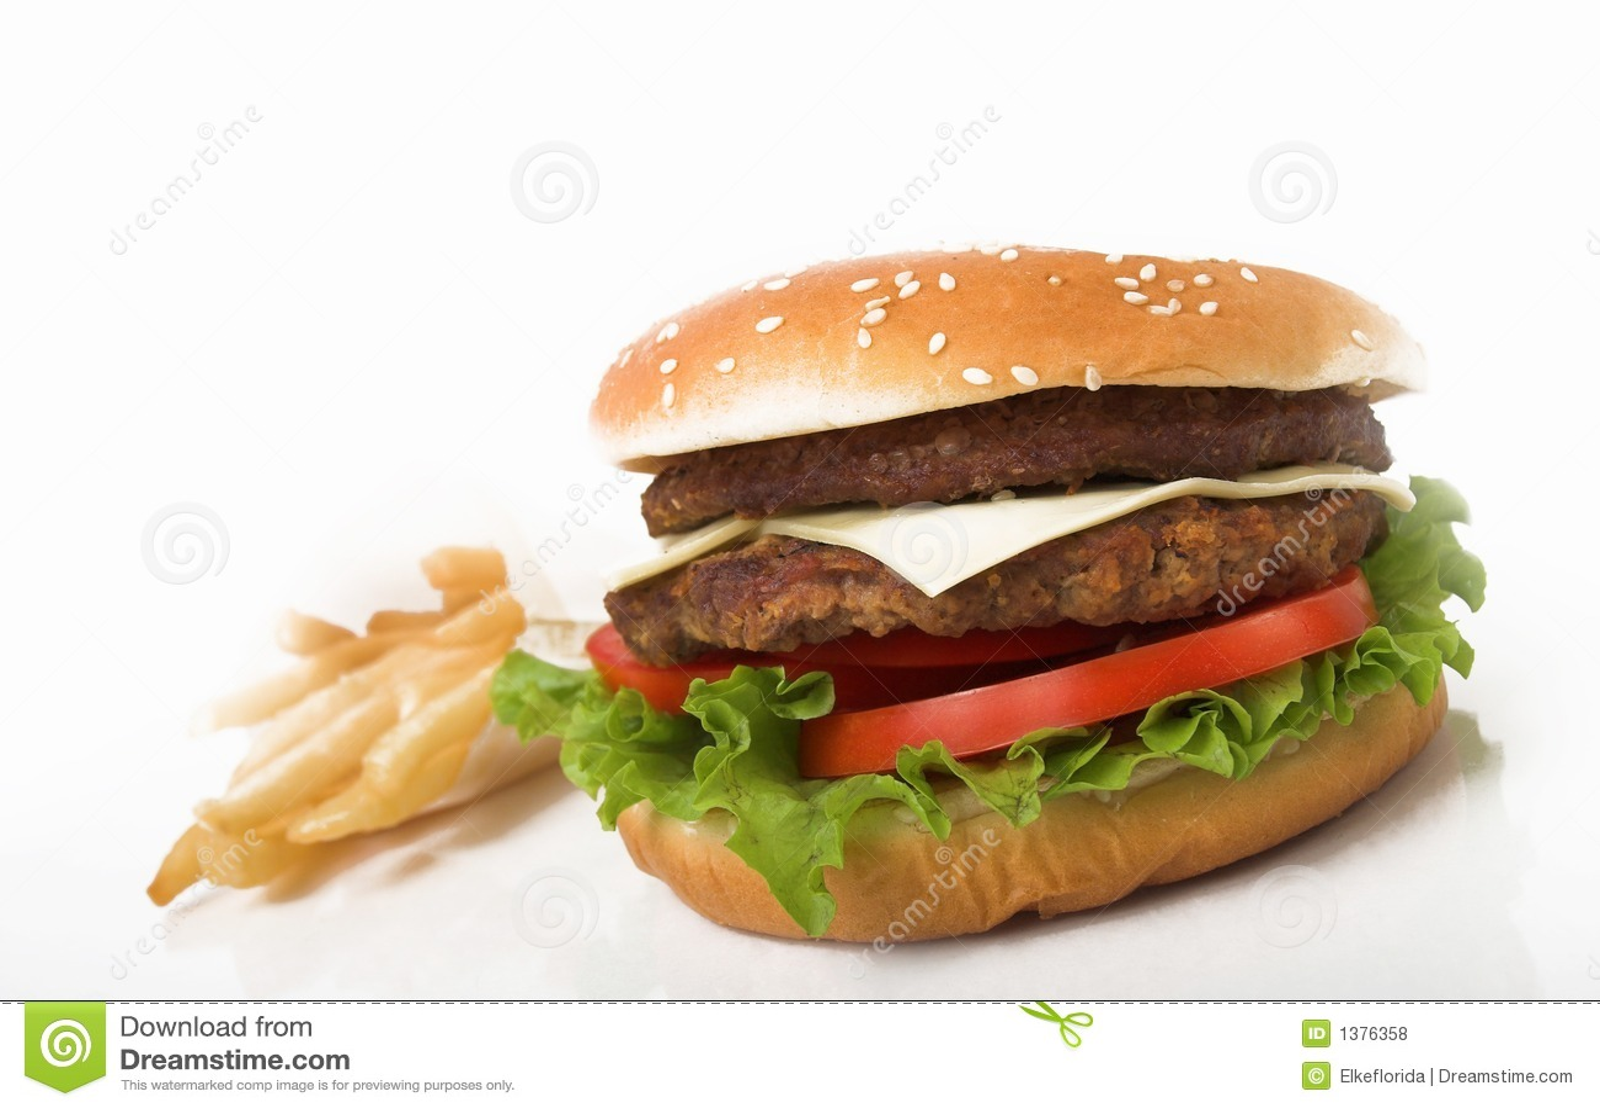 Double hamburger and fries